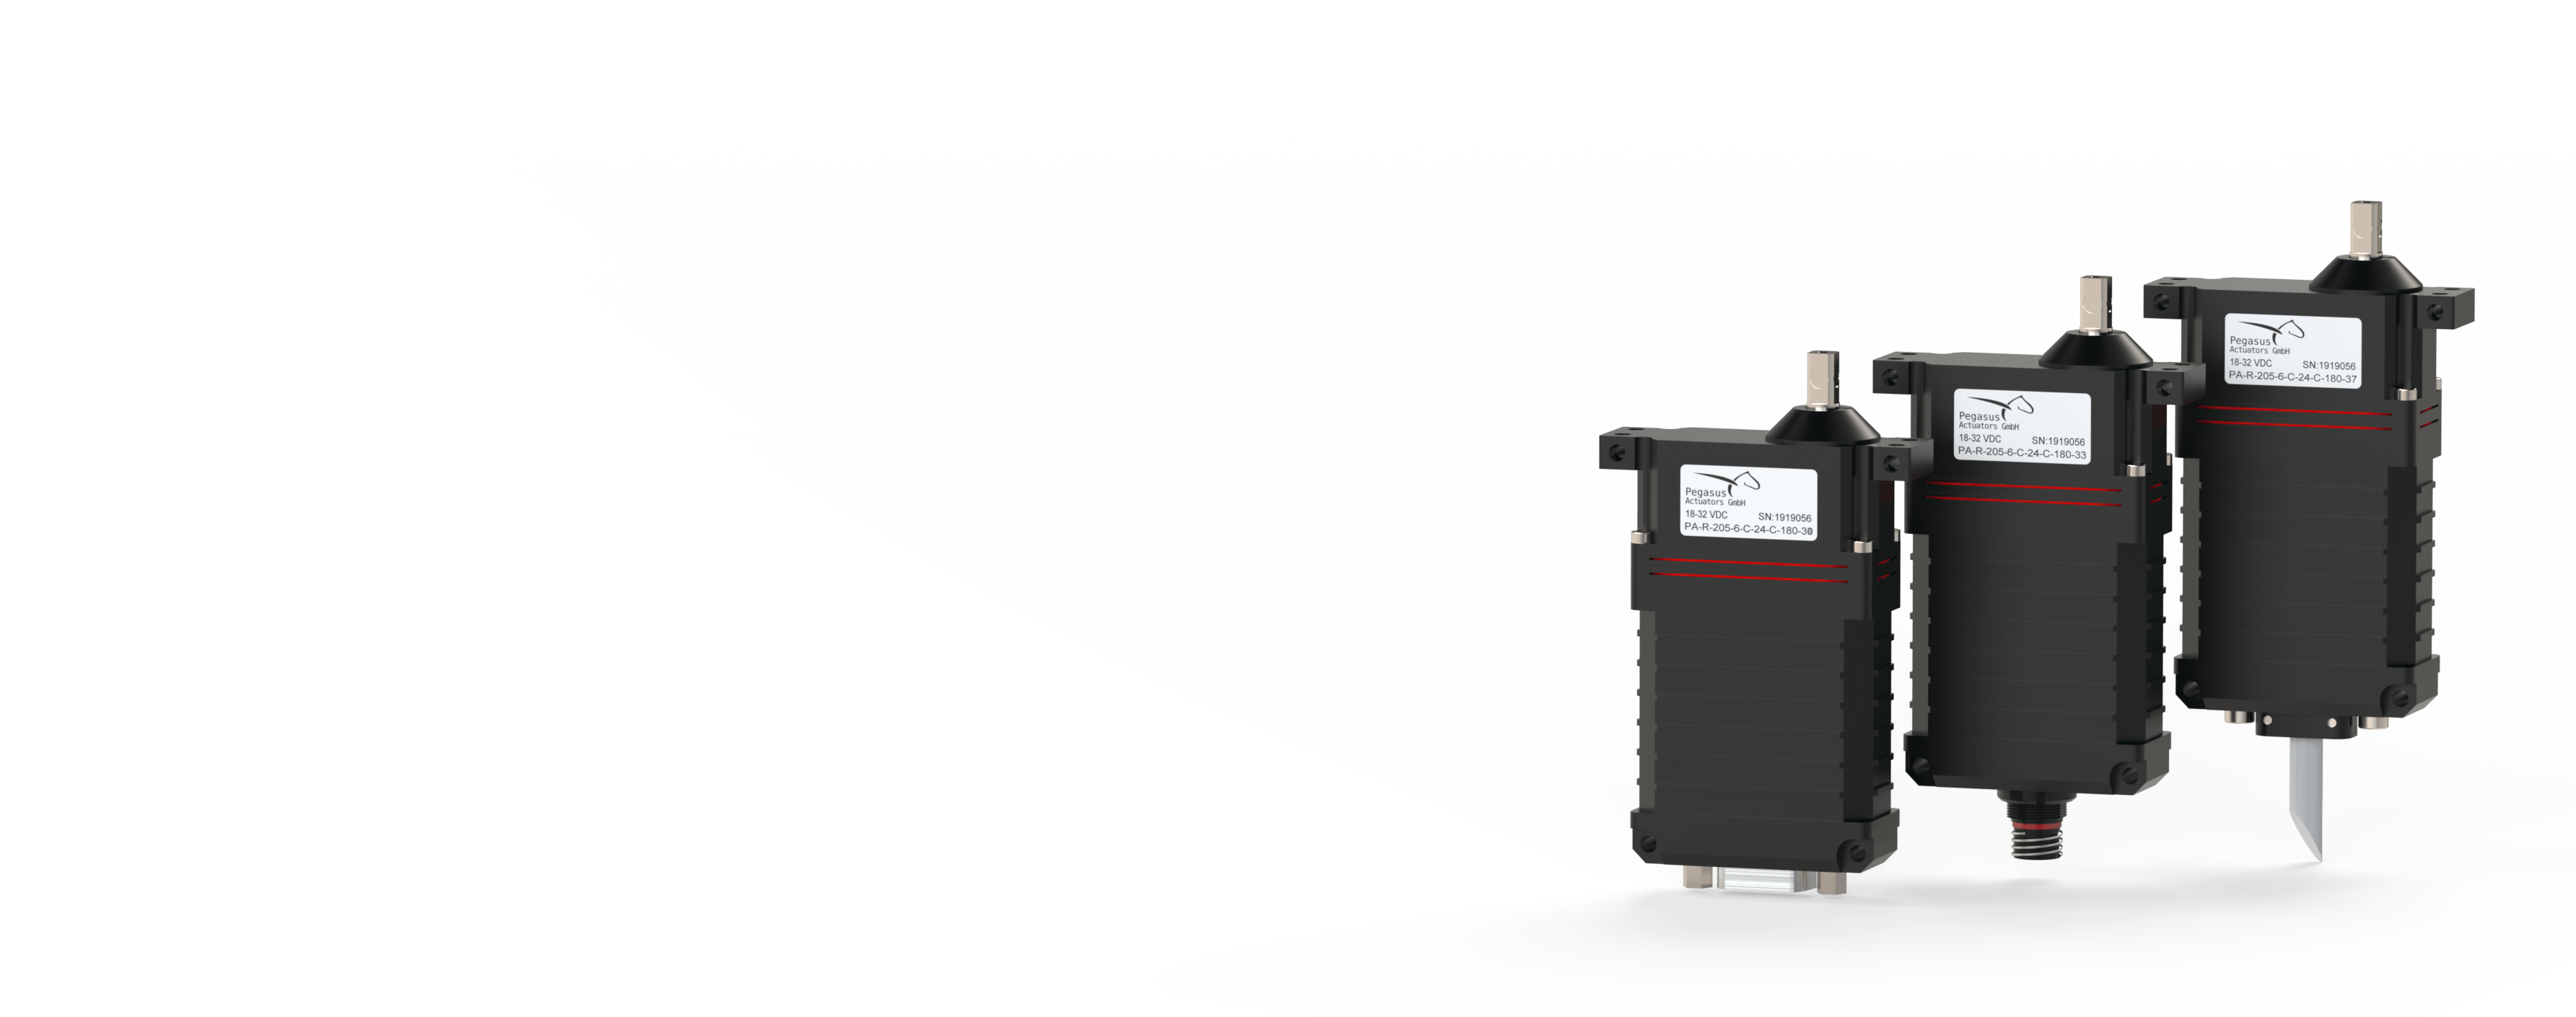 PA-R-205-6 Industrial Actuators